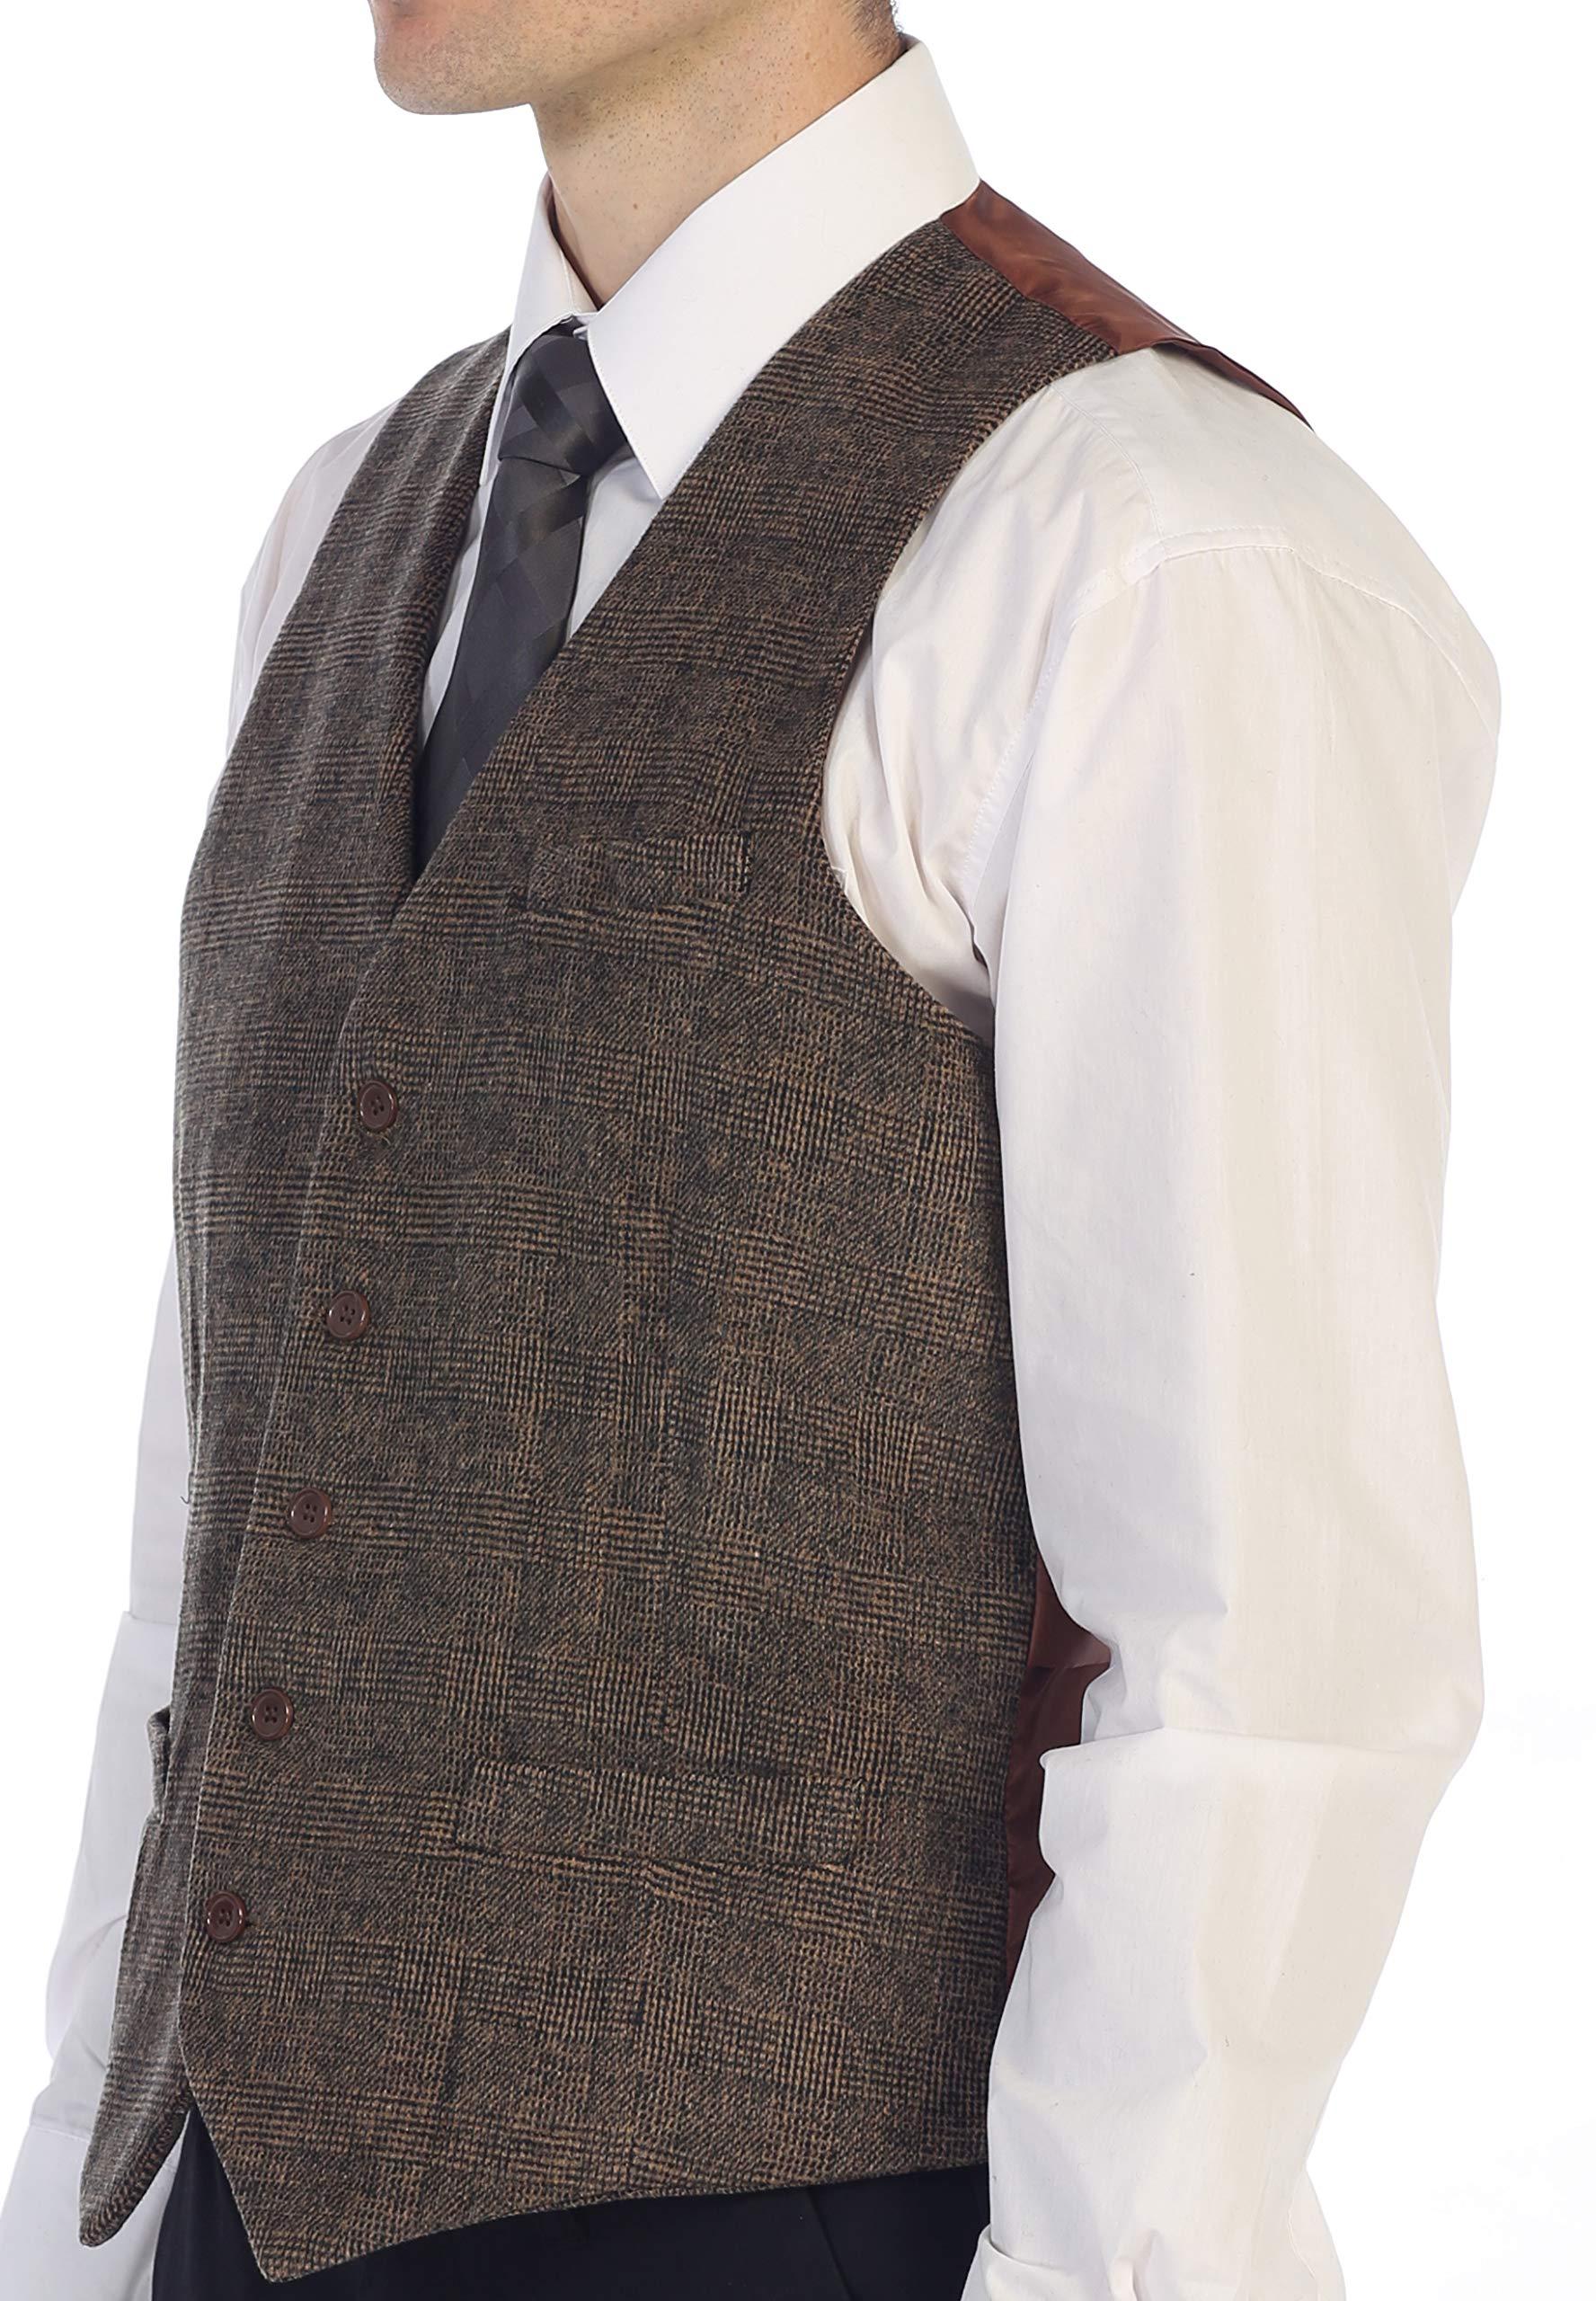 b6e21f884c6 Best Rated in Men s Suit Vests   Helpful Customer Reviews - Amazon.com